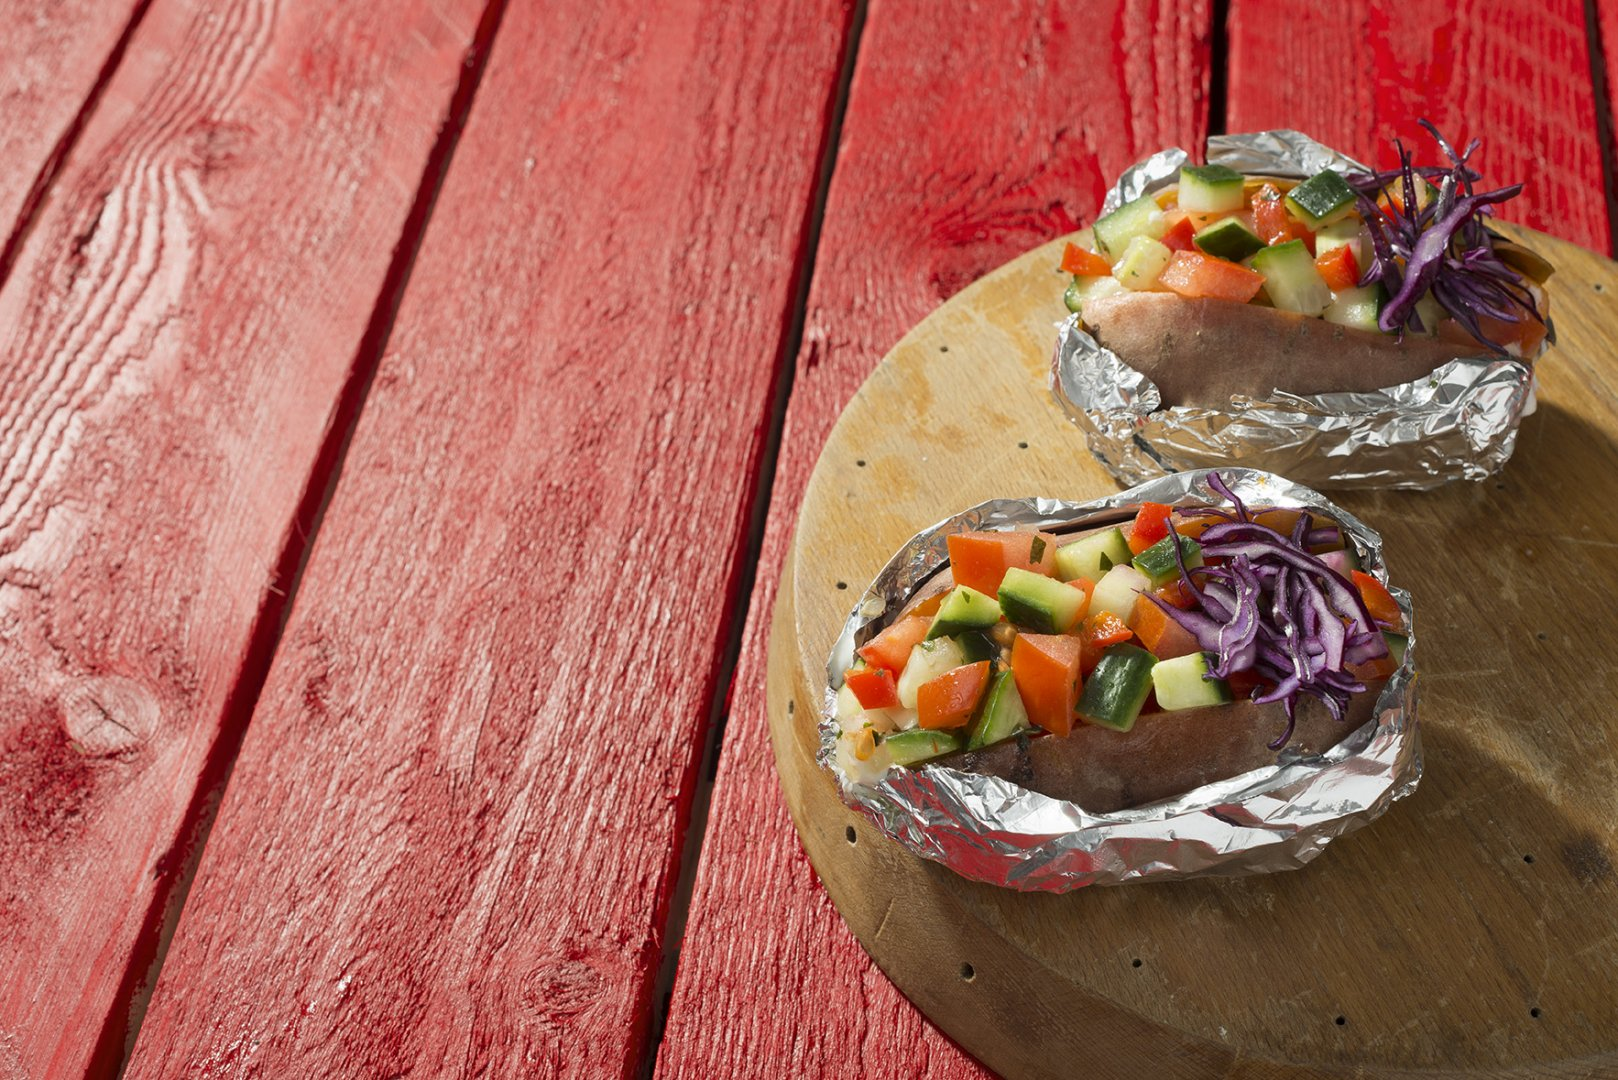 Gepofte zoete aardappel met Tomaat-Komkommer rauwkost